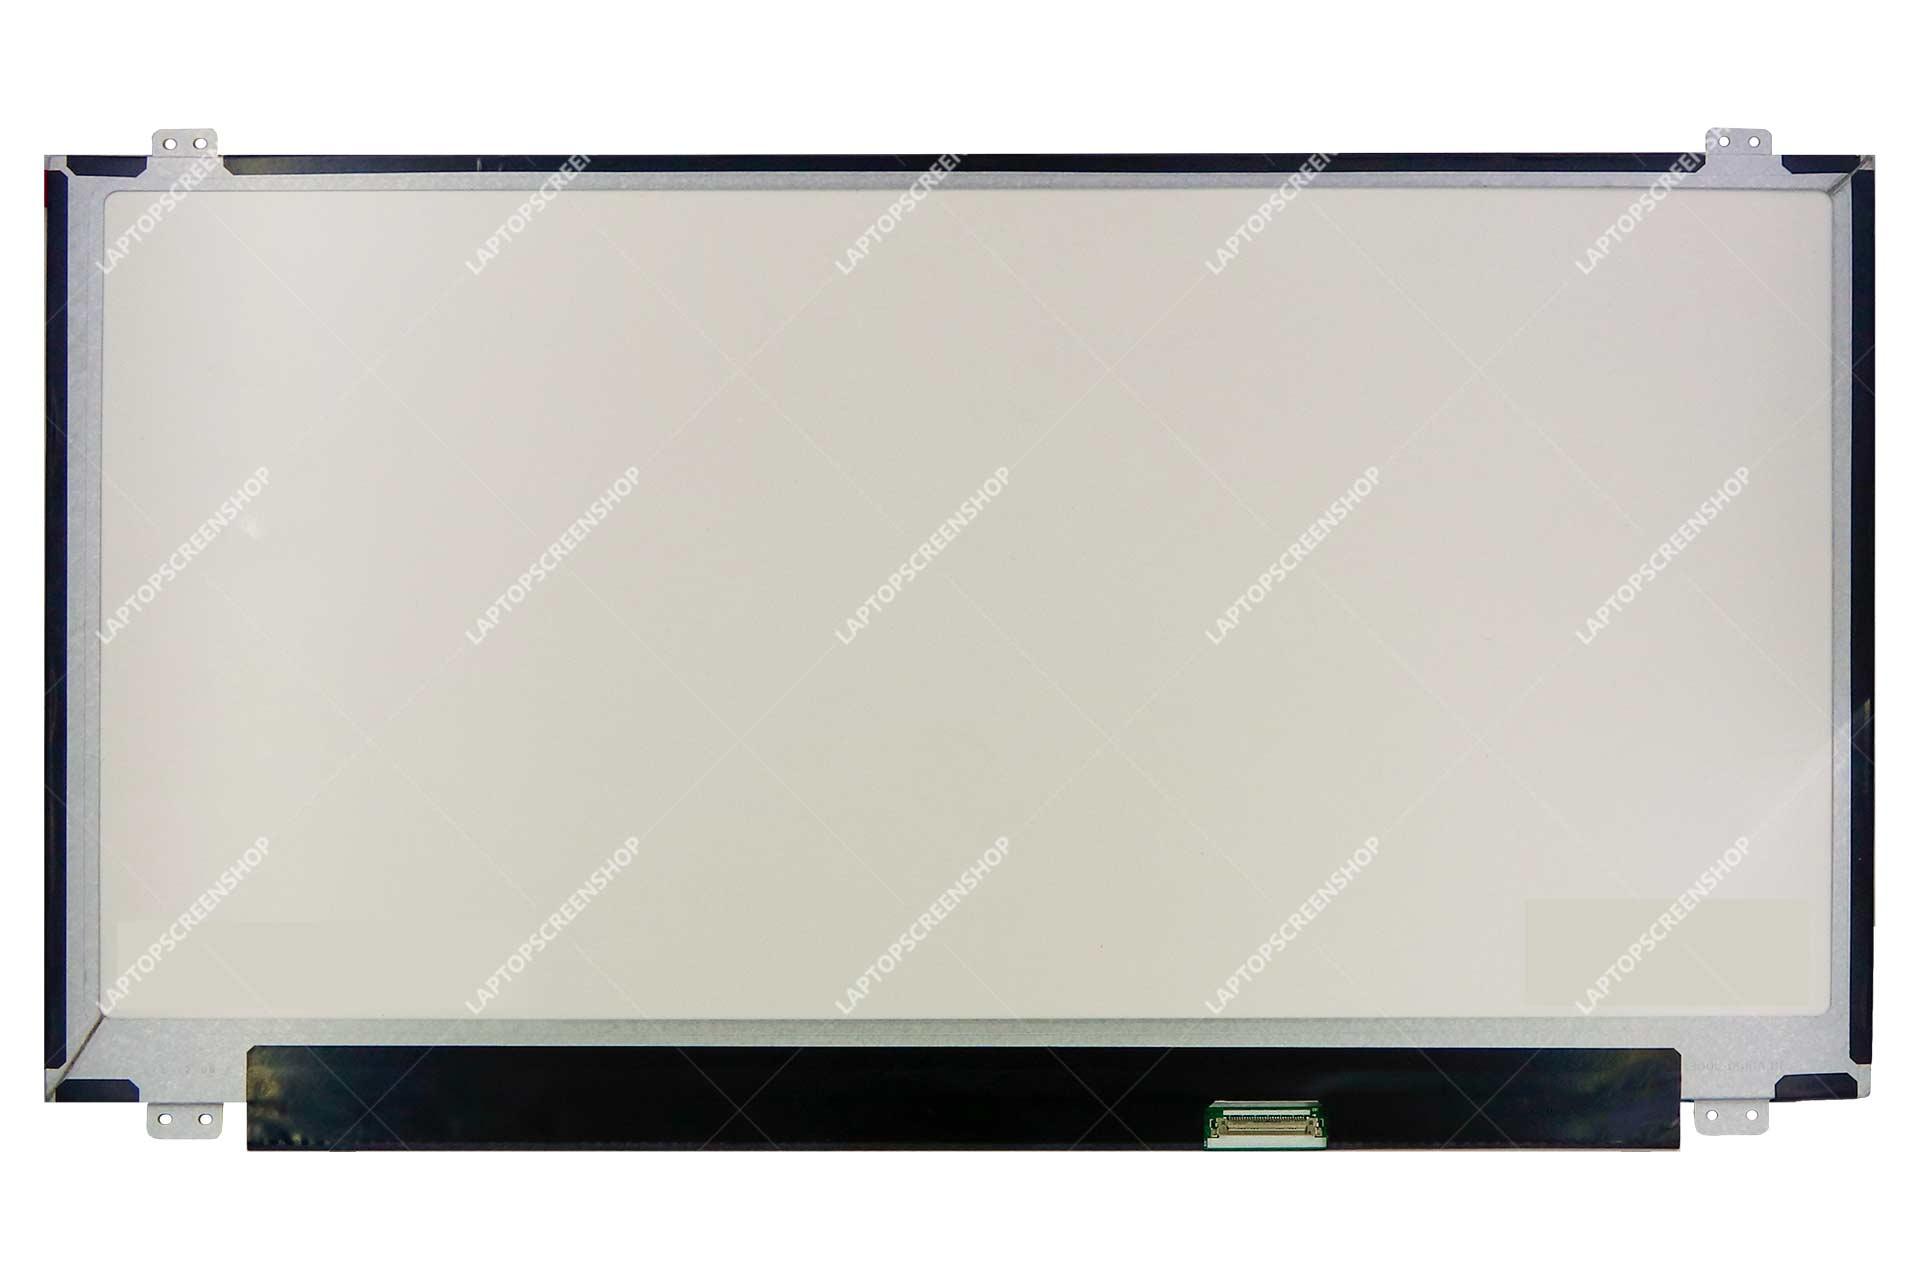 LENOVO-IDEAPAD-Z510-59400192-LCD  FHD فروشگاه لپ تاپ اسکرين   تعمير لپ تاپ